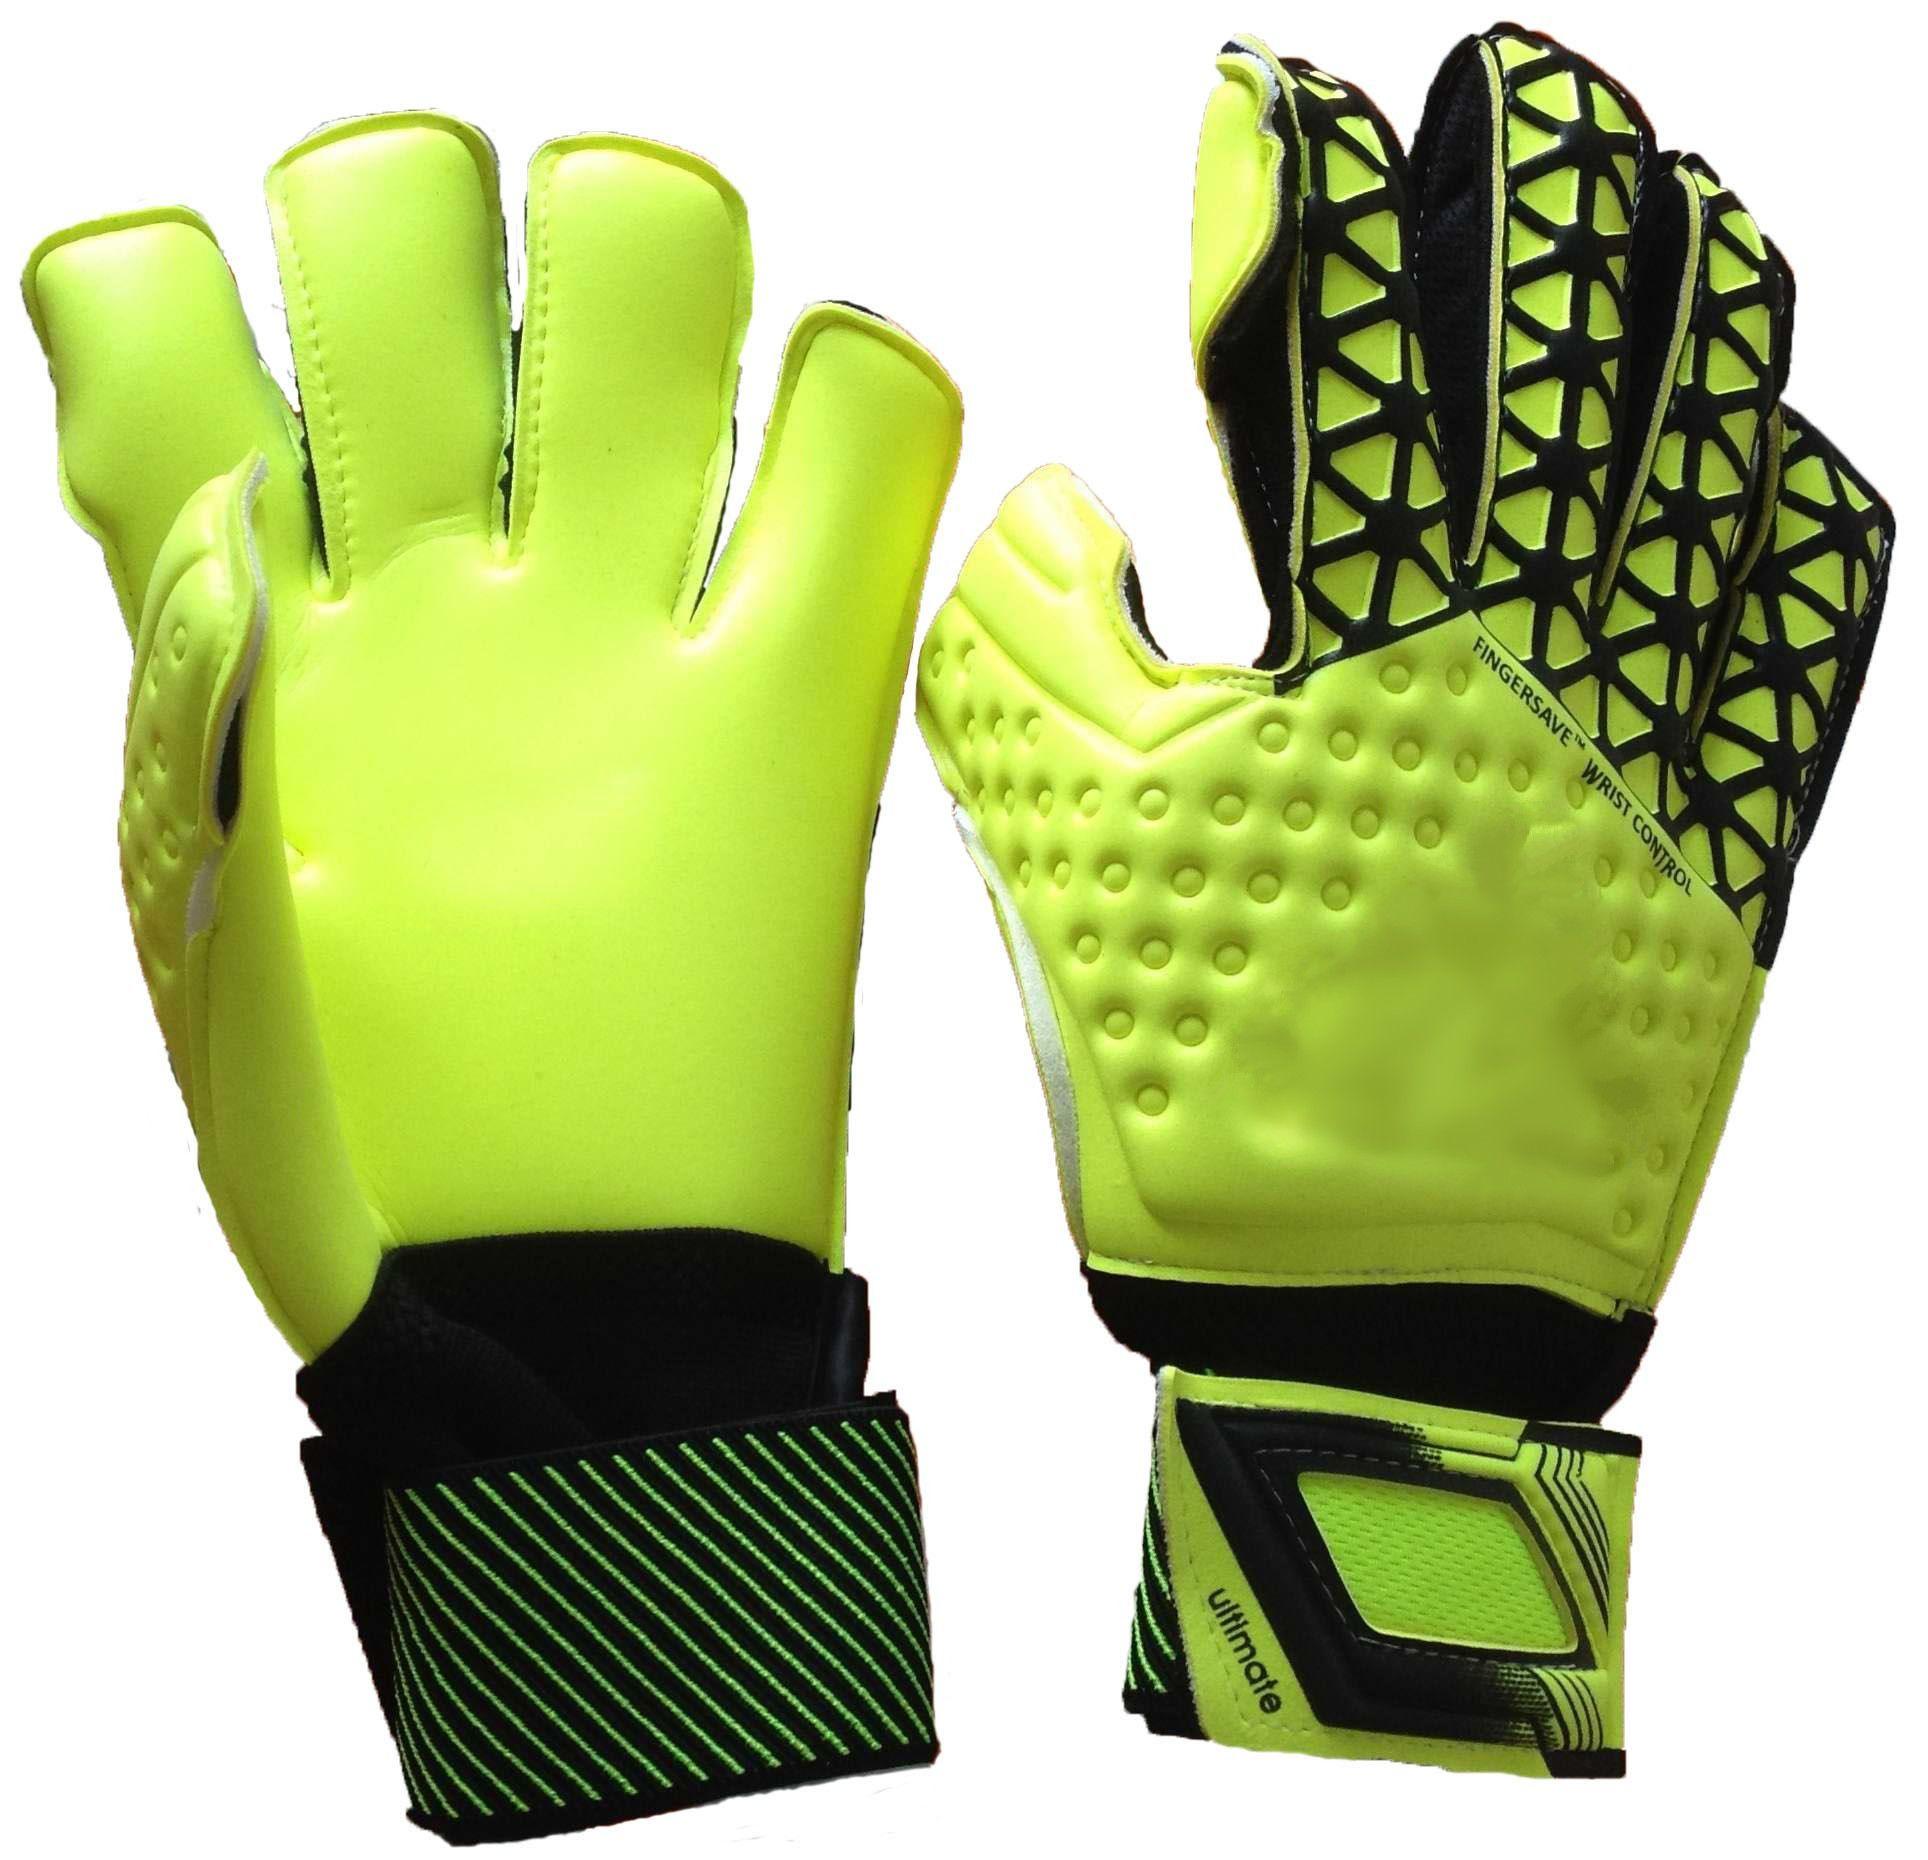 2015 New Thickened Top Goalkeeper Latex Gloves Sports Football Gloves  Material Motorcycle Glovescy UK 2019 From S6652220 0effddf67